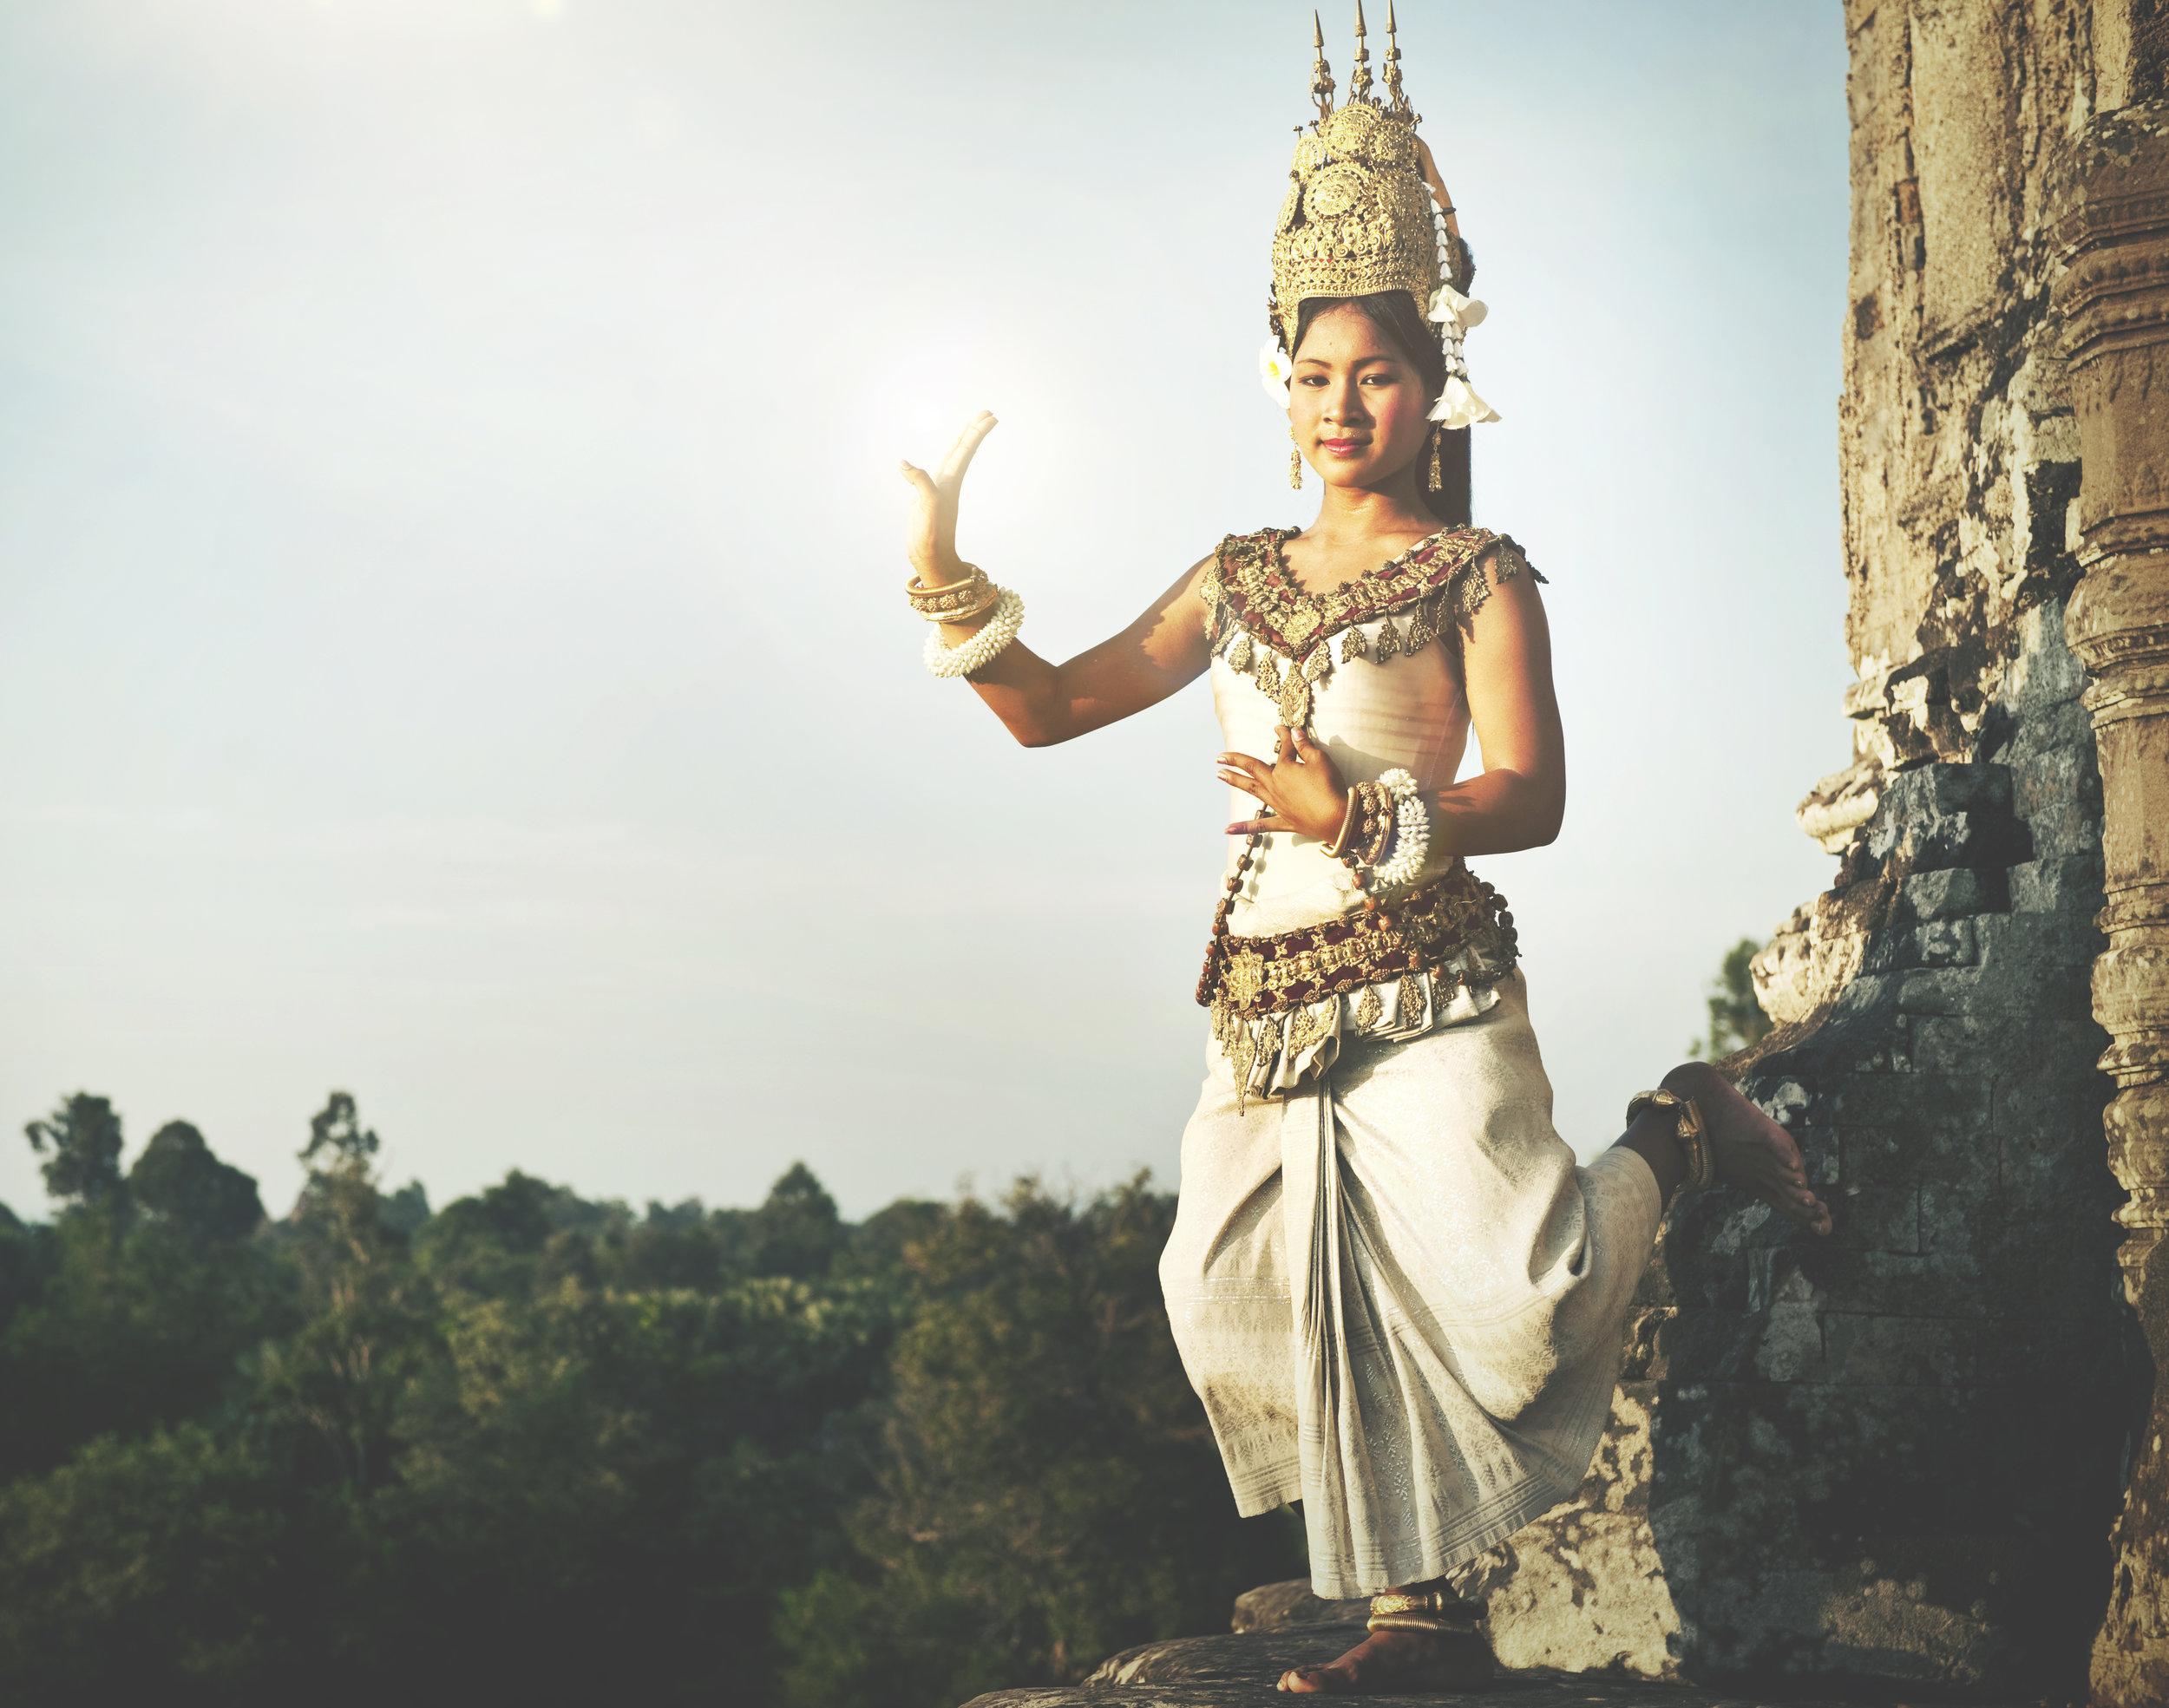 She is sacred dance -